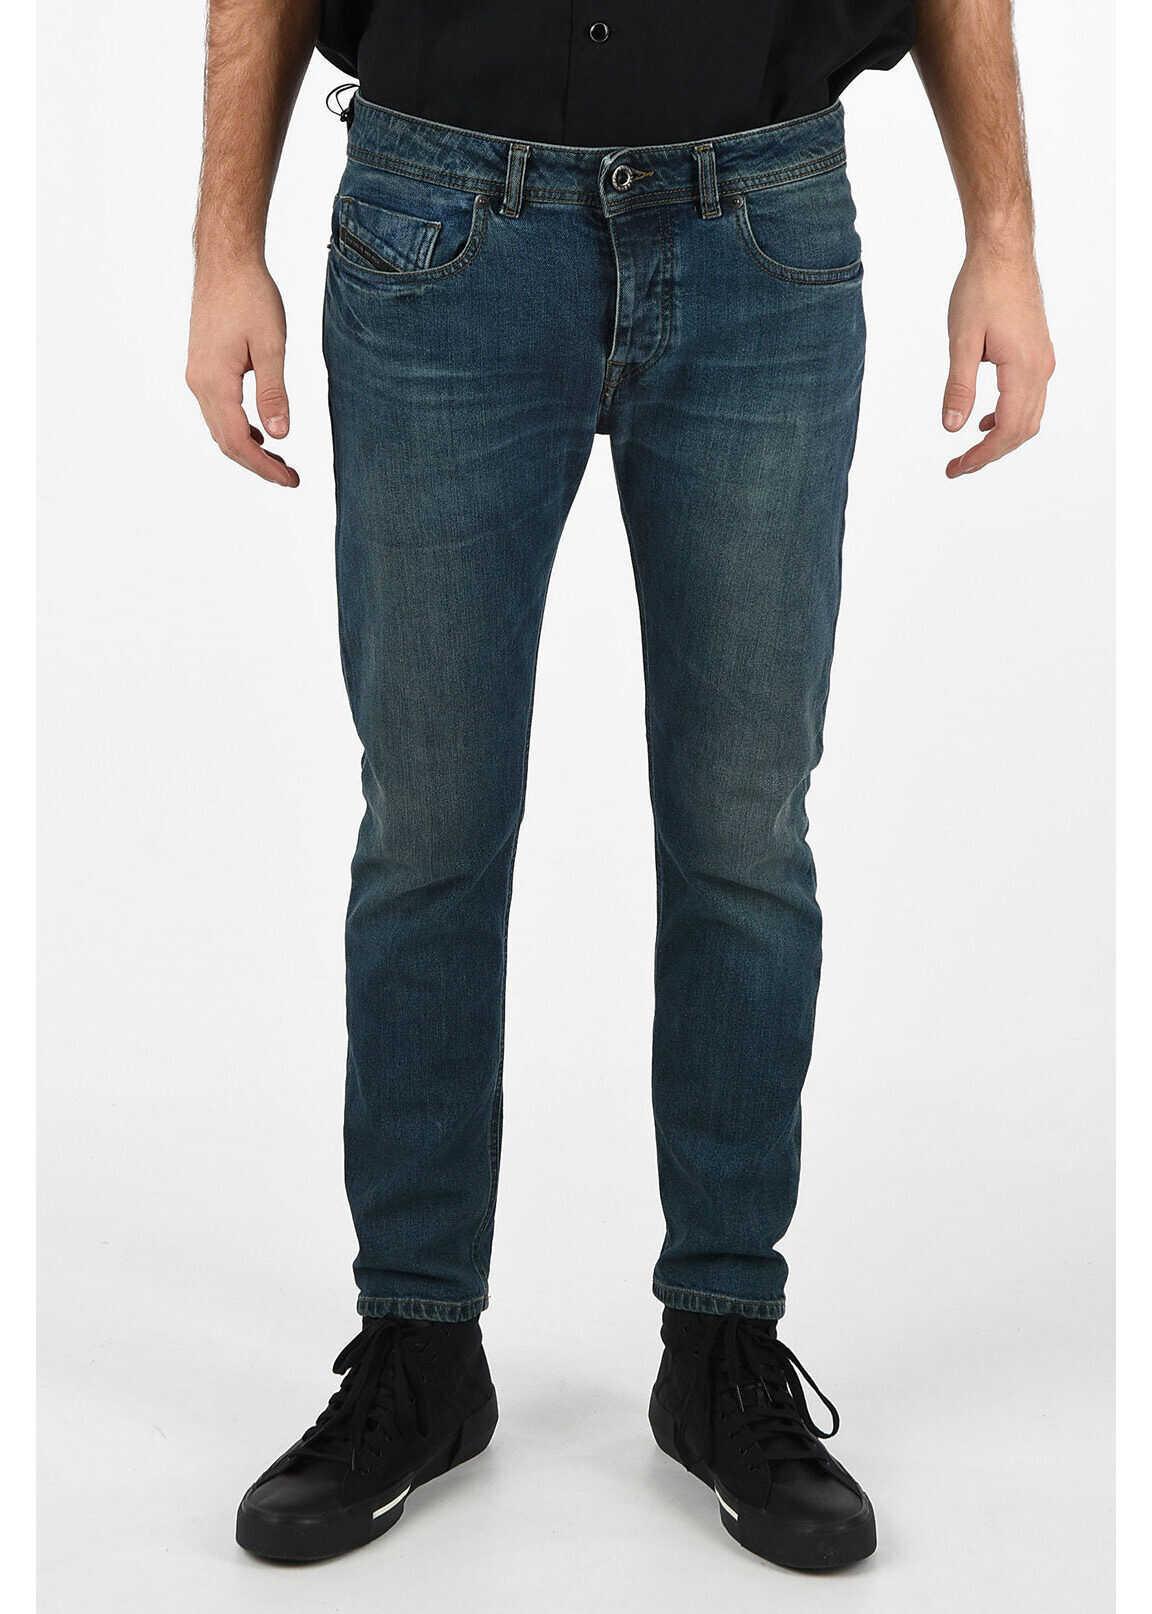 BLACK GOLD 17cm skinny fit TYPE-214 Jeans thumbnail